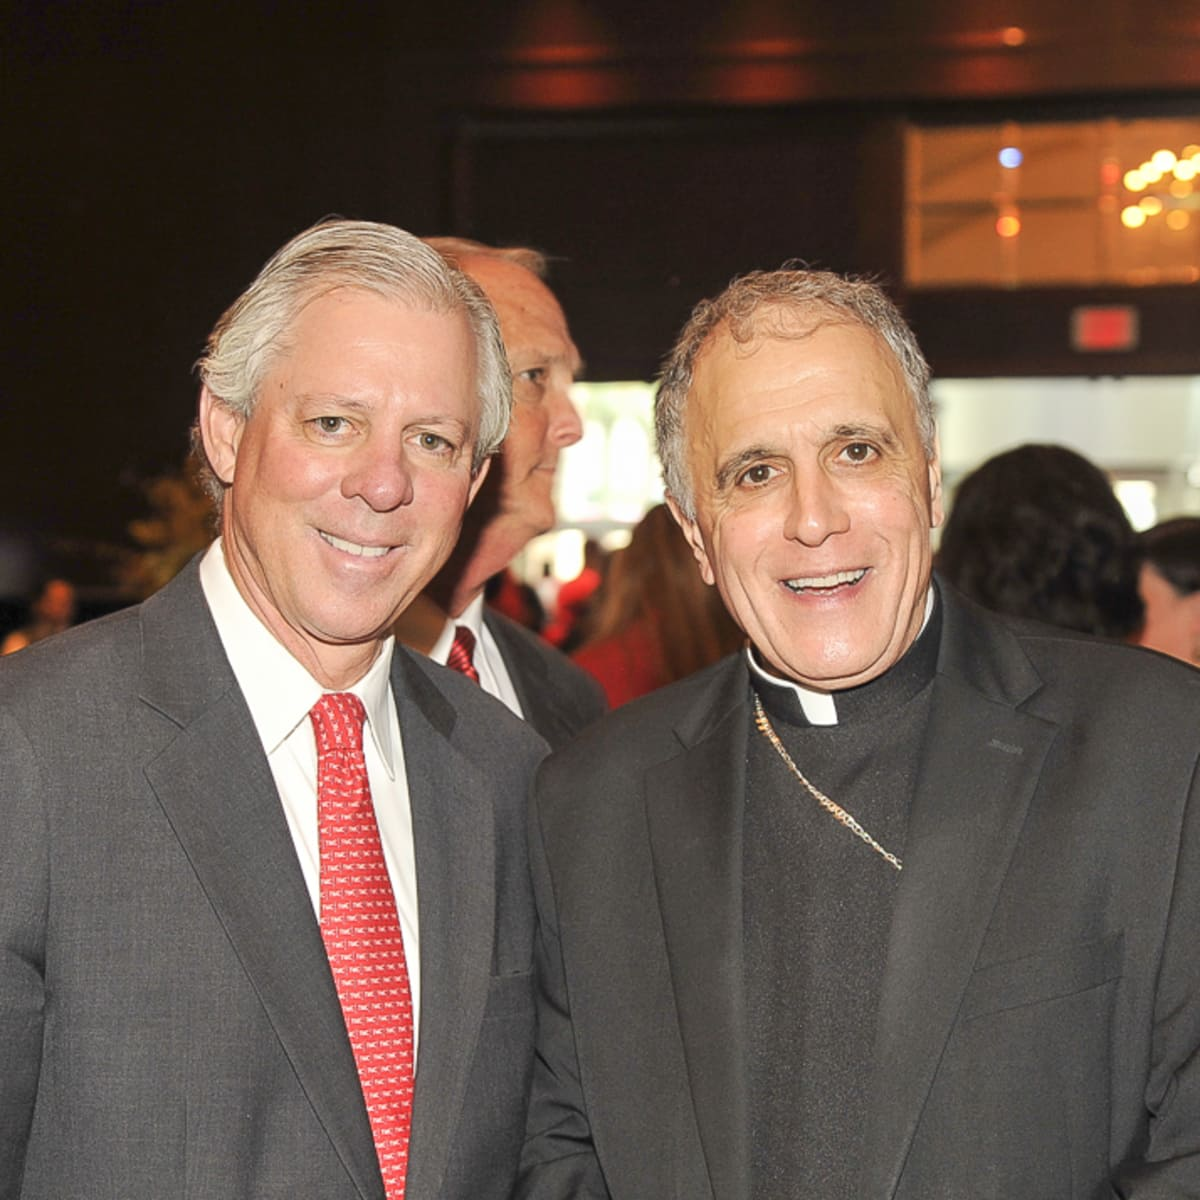 Go Red for Women, 5/16, Dr. Robert Robbins, Cardinal Daniel DiNardo